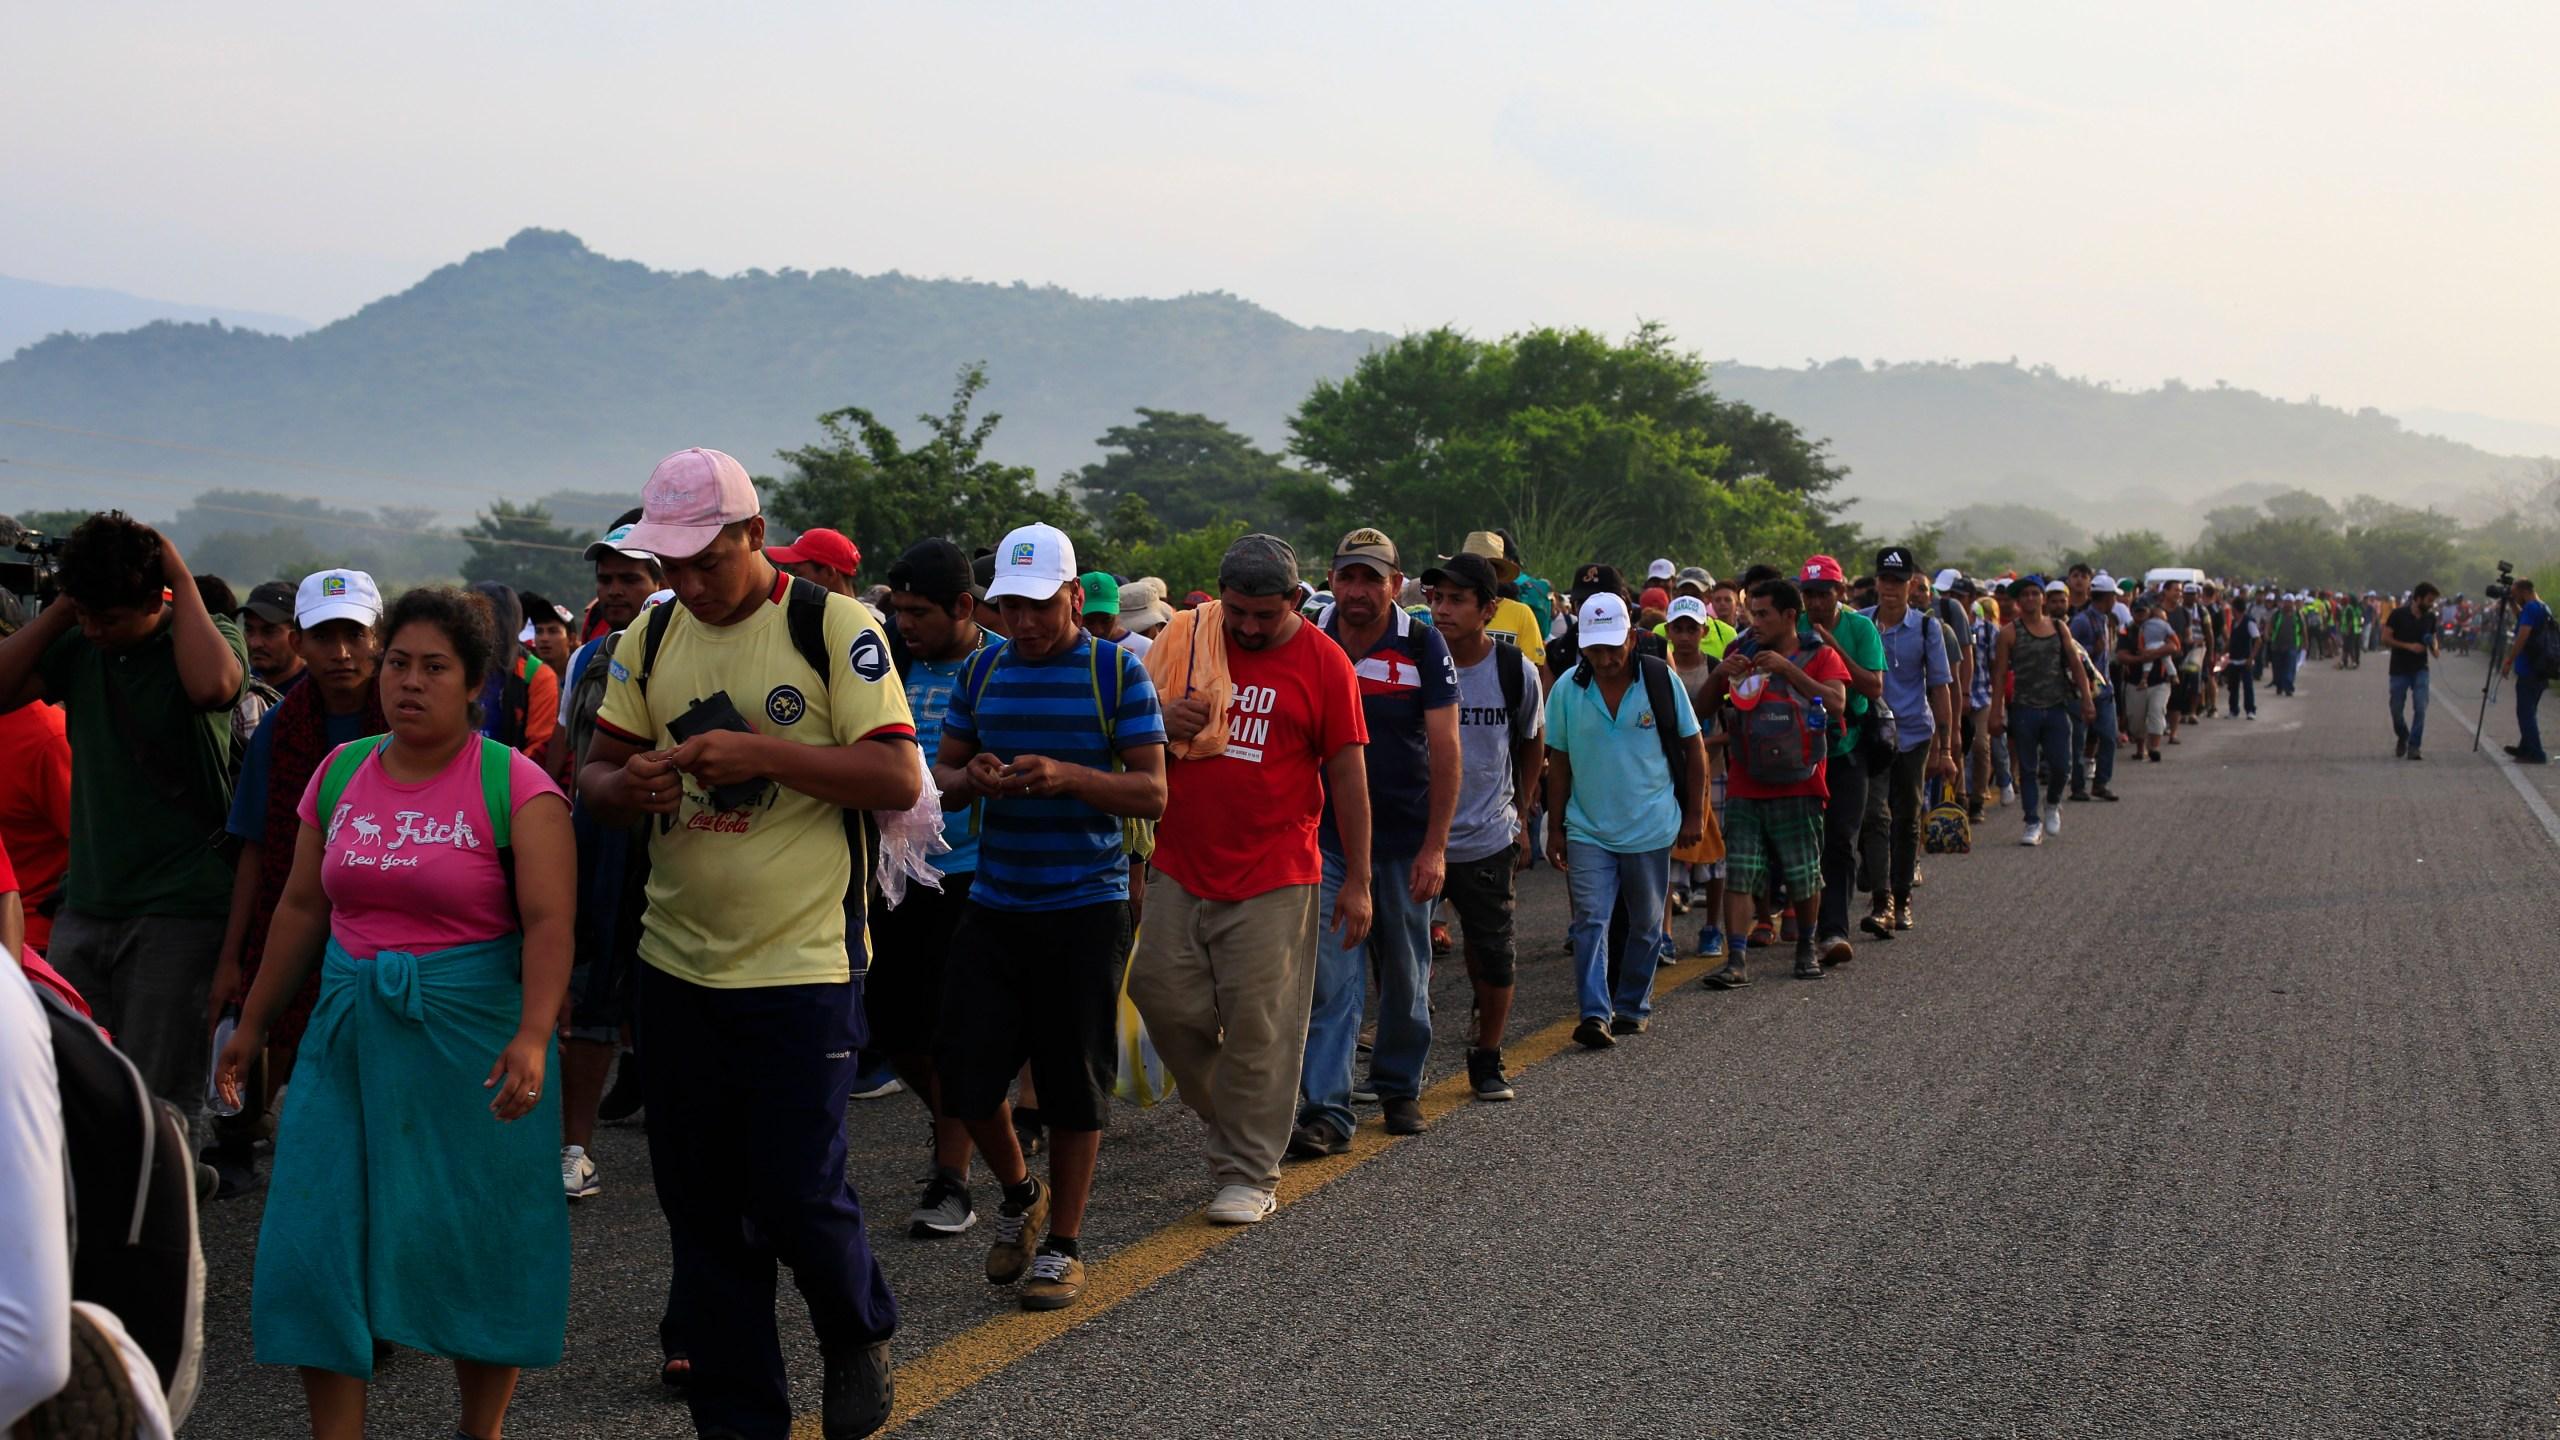 Central_America_Migrant_Caravan_36874-159532.jpg55151449